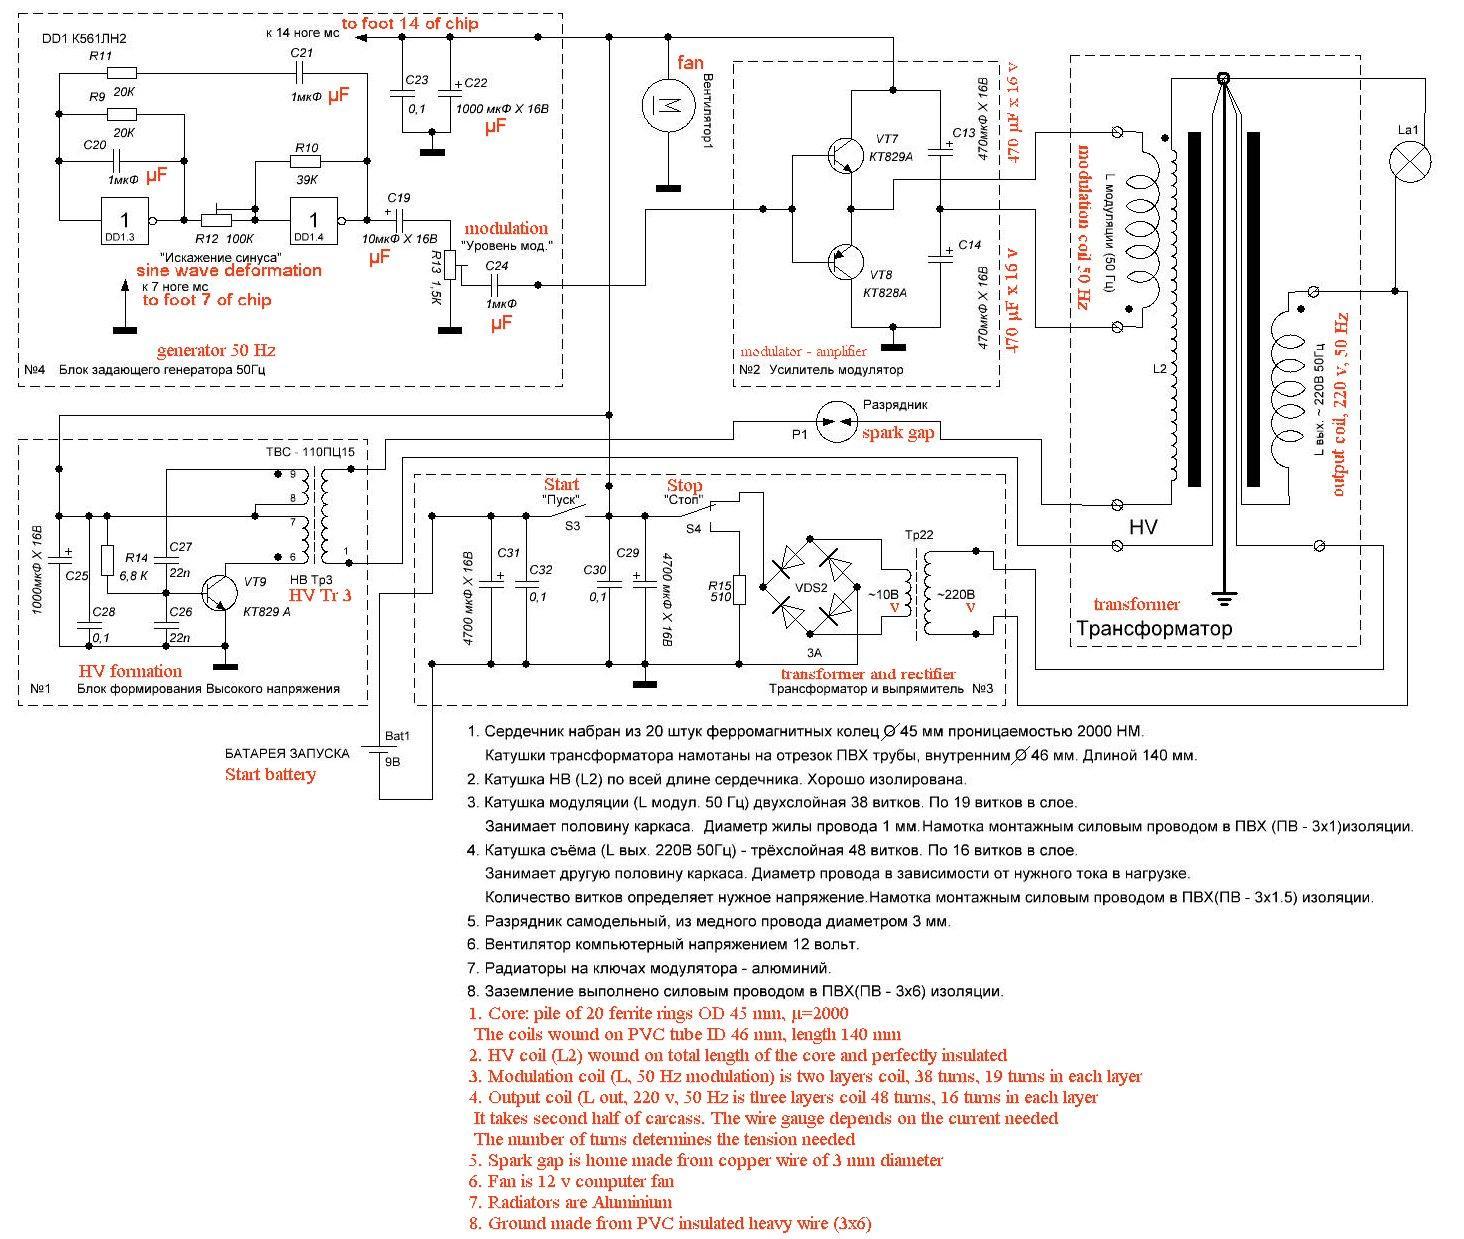 hight resolution of kapanadze generator schematic wiring diagram operations a kapanadze generator replication febuary 2013 kapanadze free energy generator